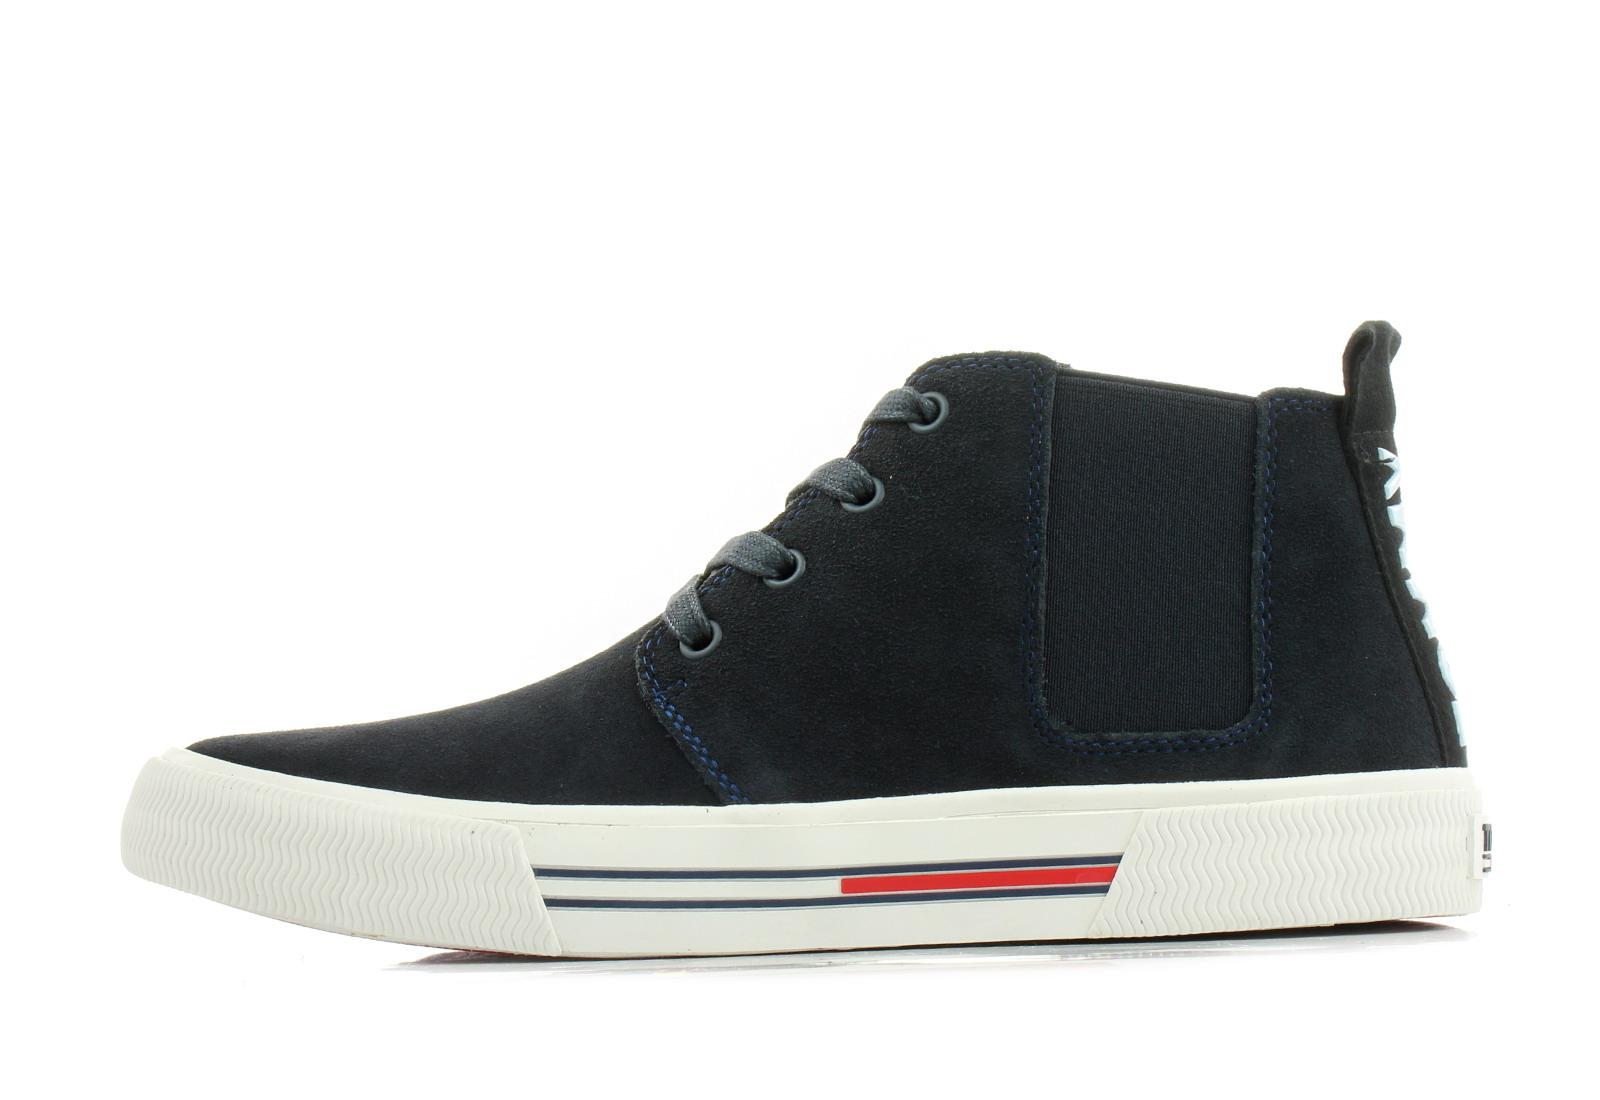 5e33e80ab0 Tommy Hilfiger Cipő - Dale 1b - 18F-0127-006 - Office Shoes Magyarország